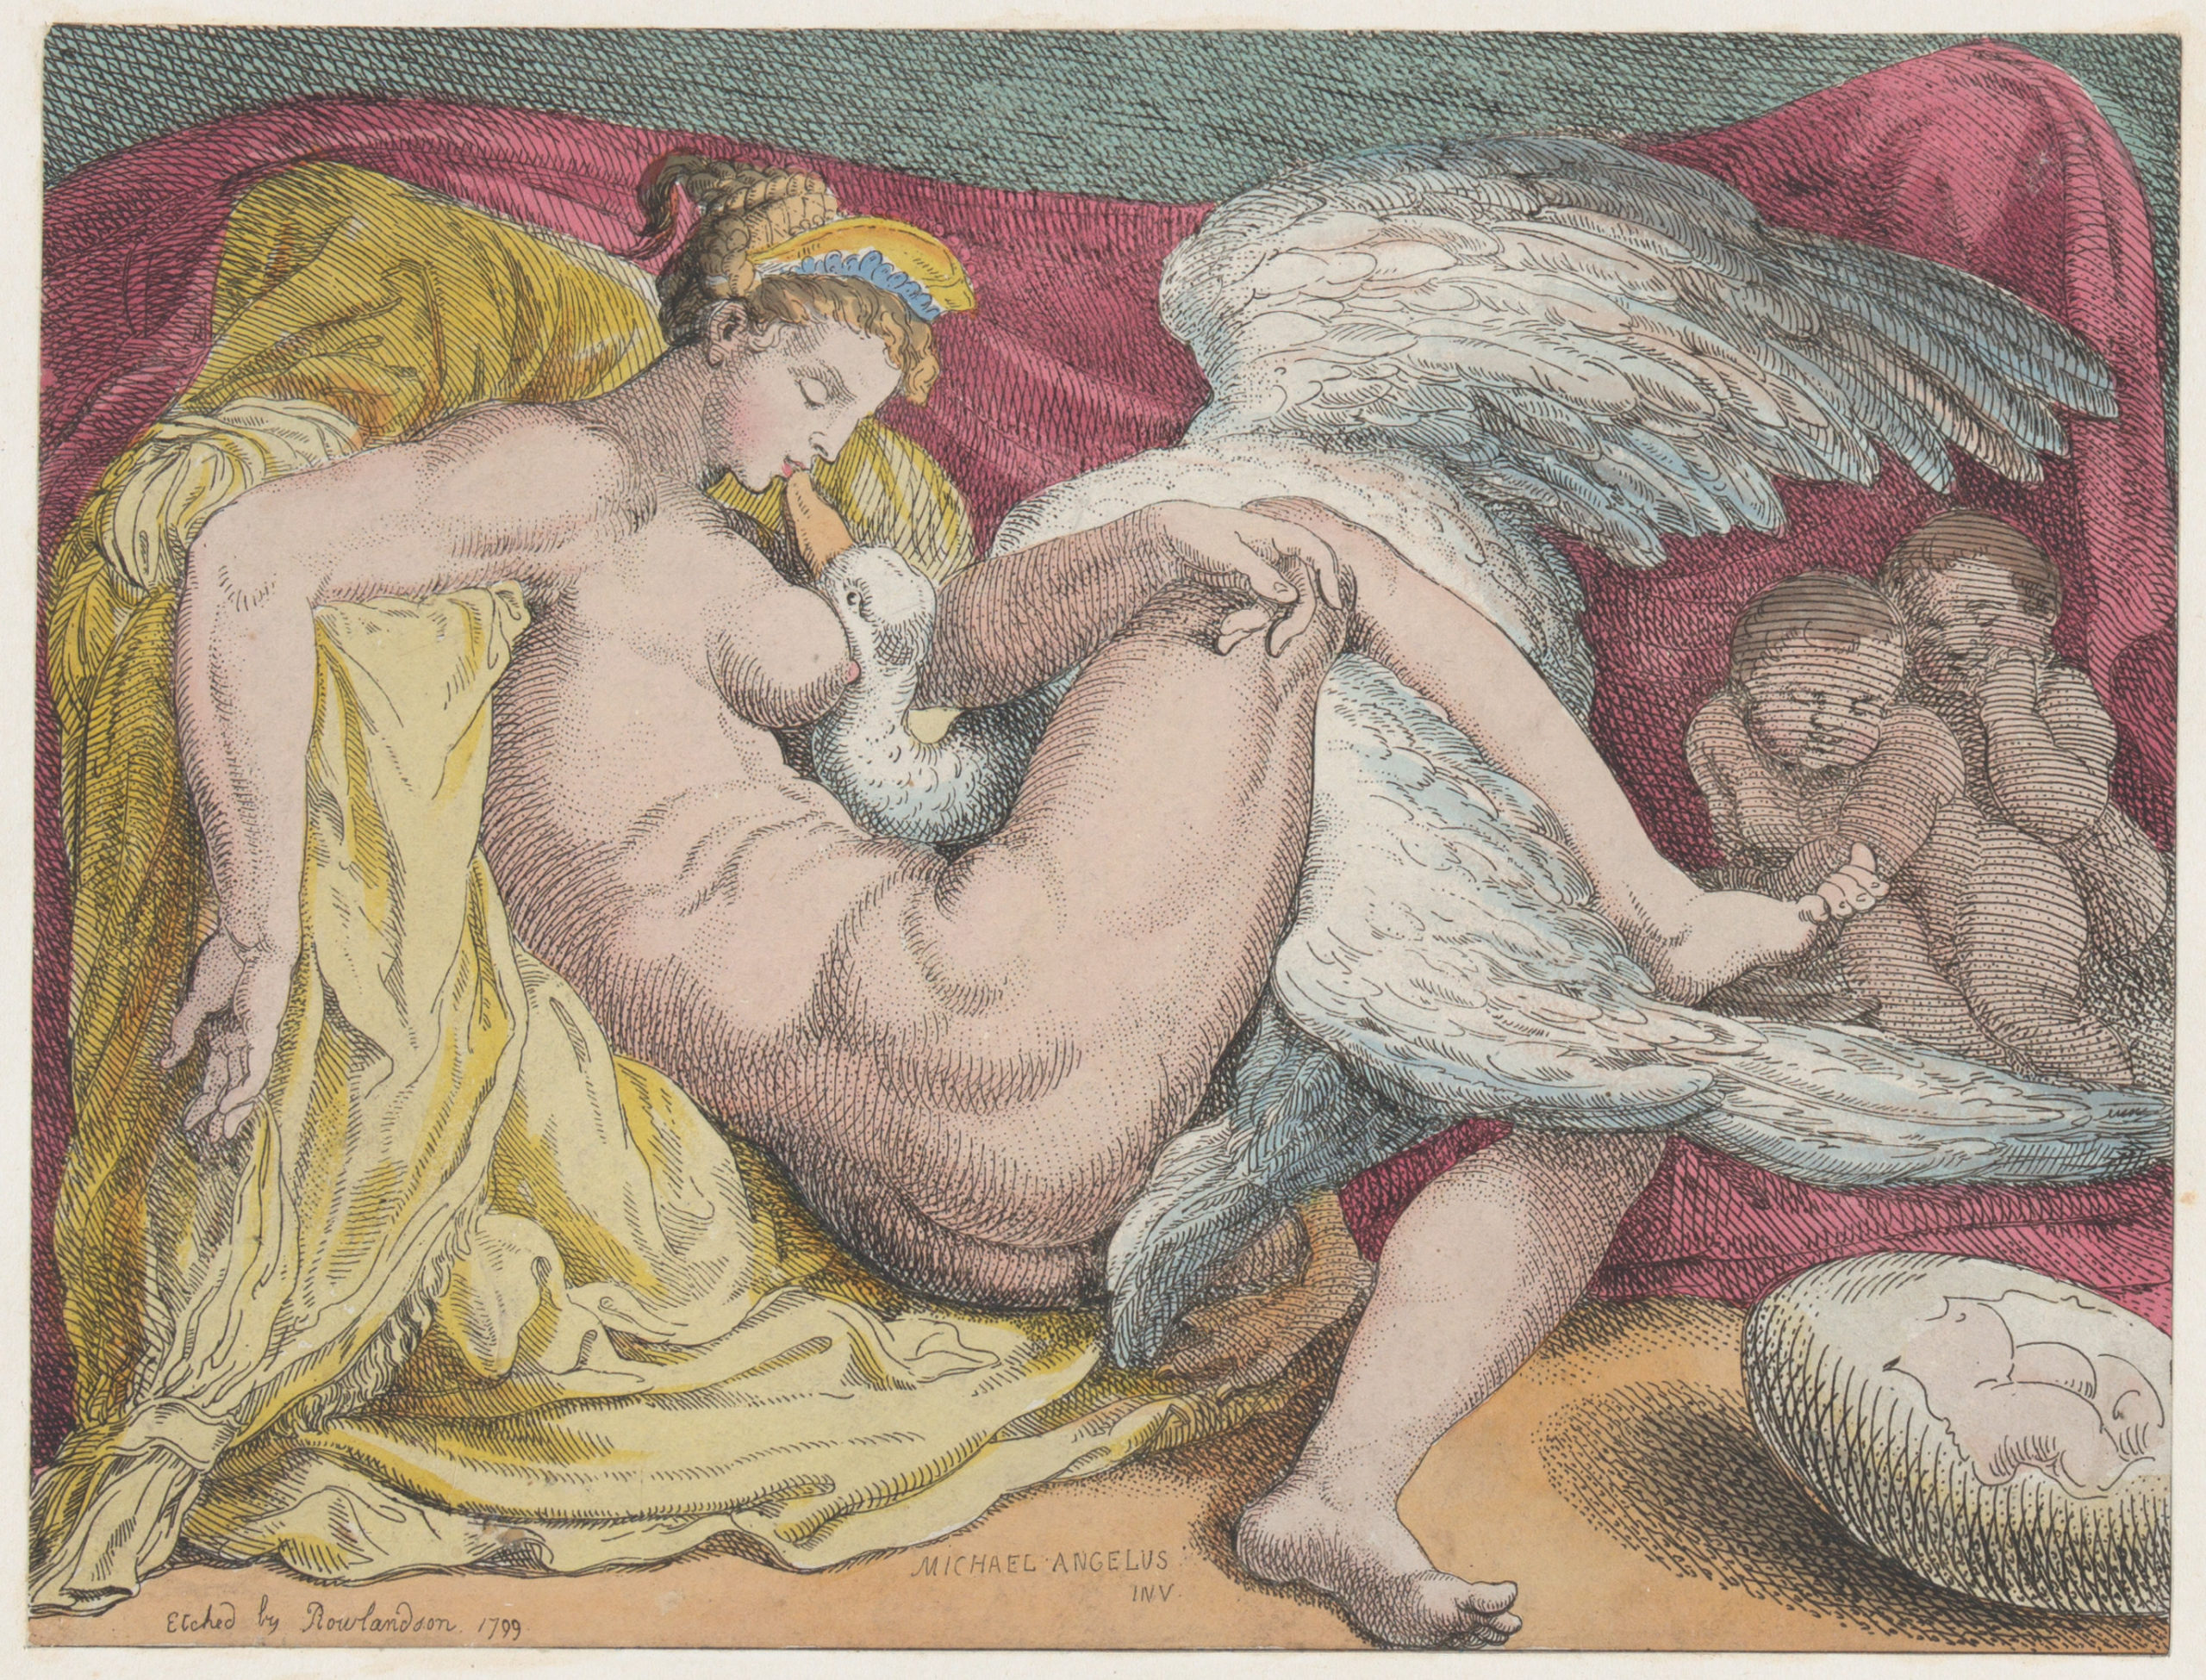 Leda and the Swan 1799 Thomas Rowlandson After Michelangelo Buonarroti